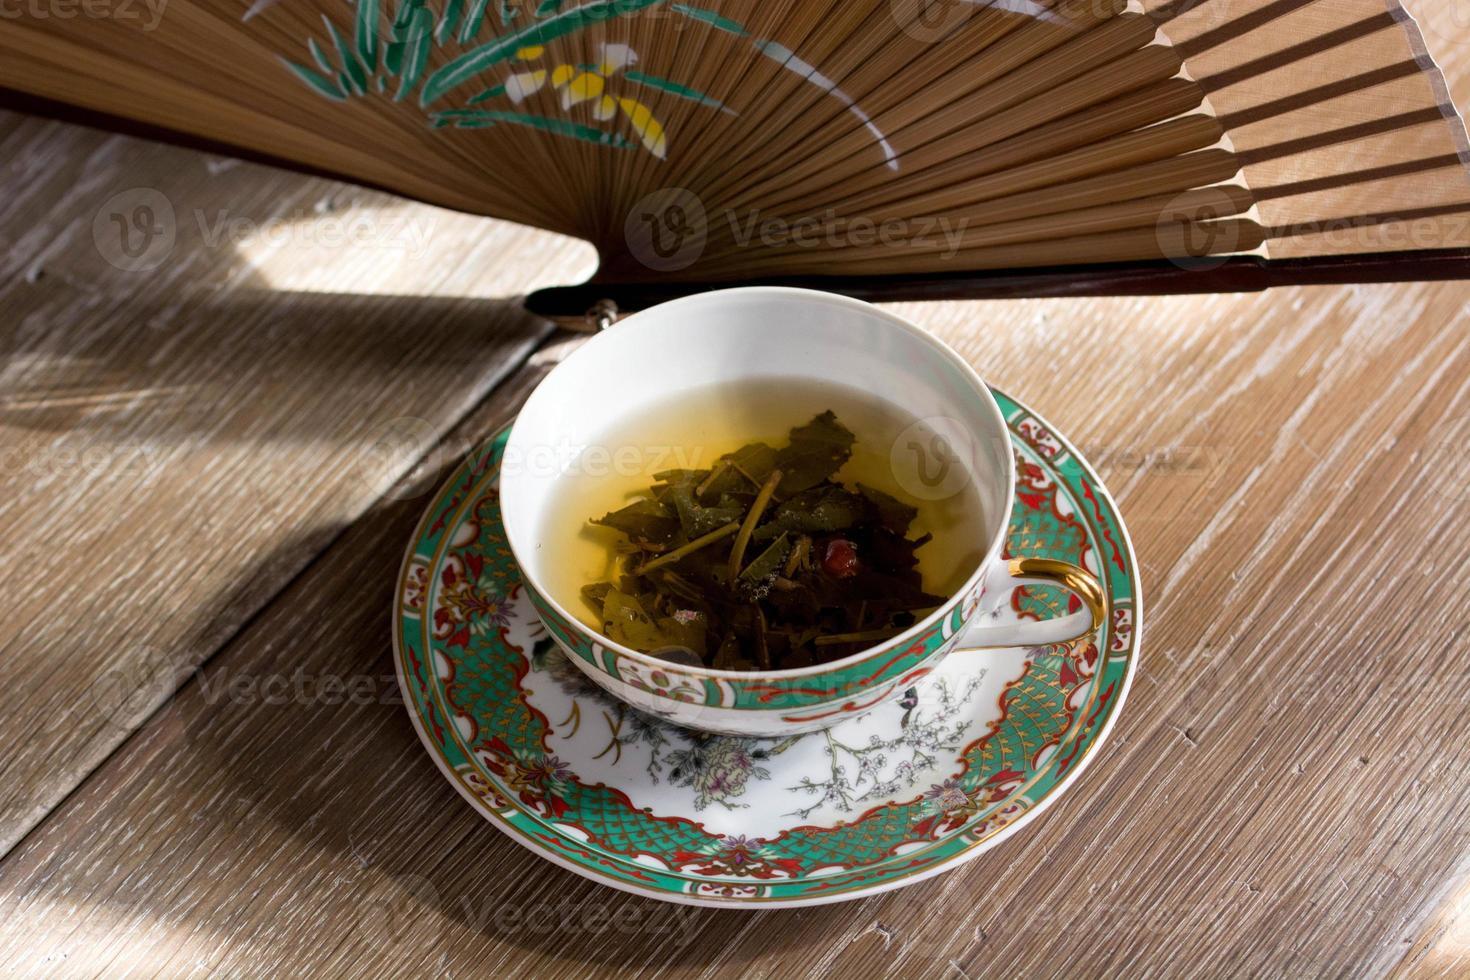 Green tea photo